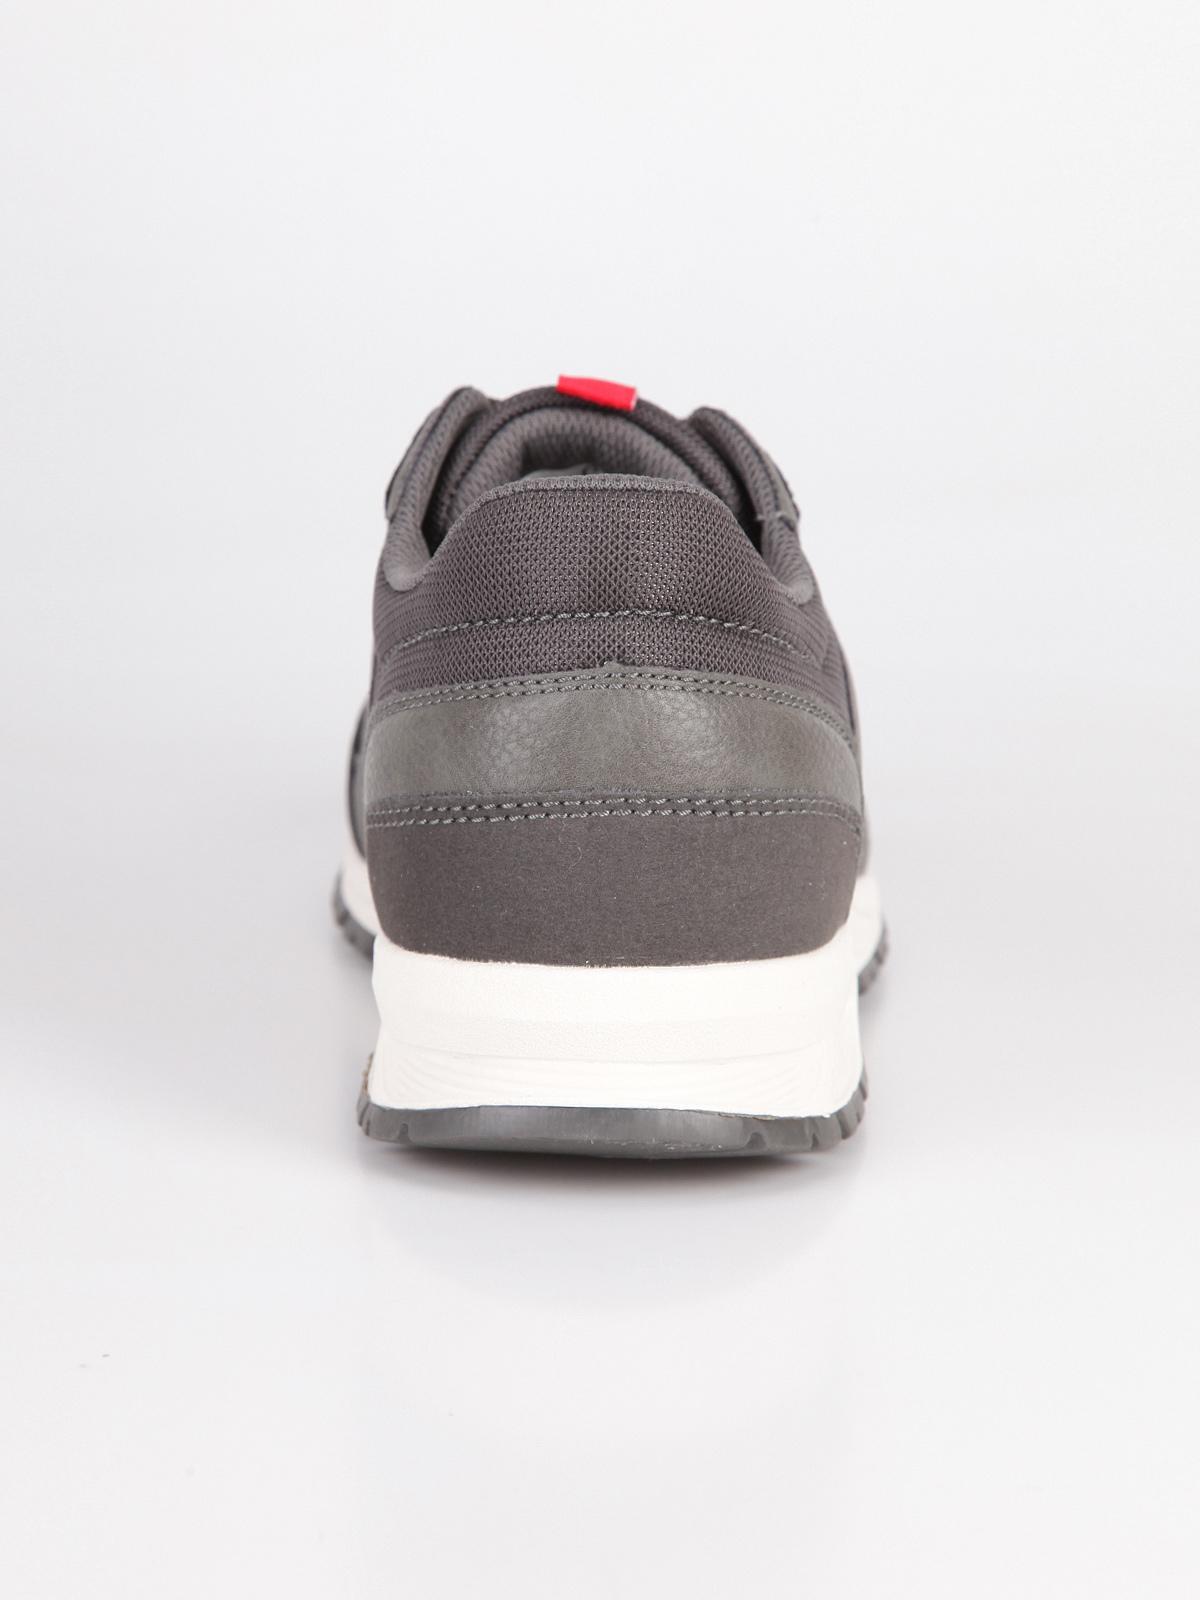 ankommen verkauft niedrigerer Preis mit pierre cardin Men's spring shoes - Gray | MecShopping